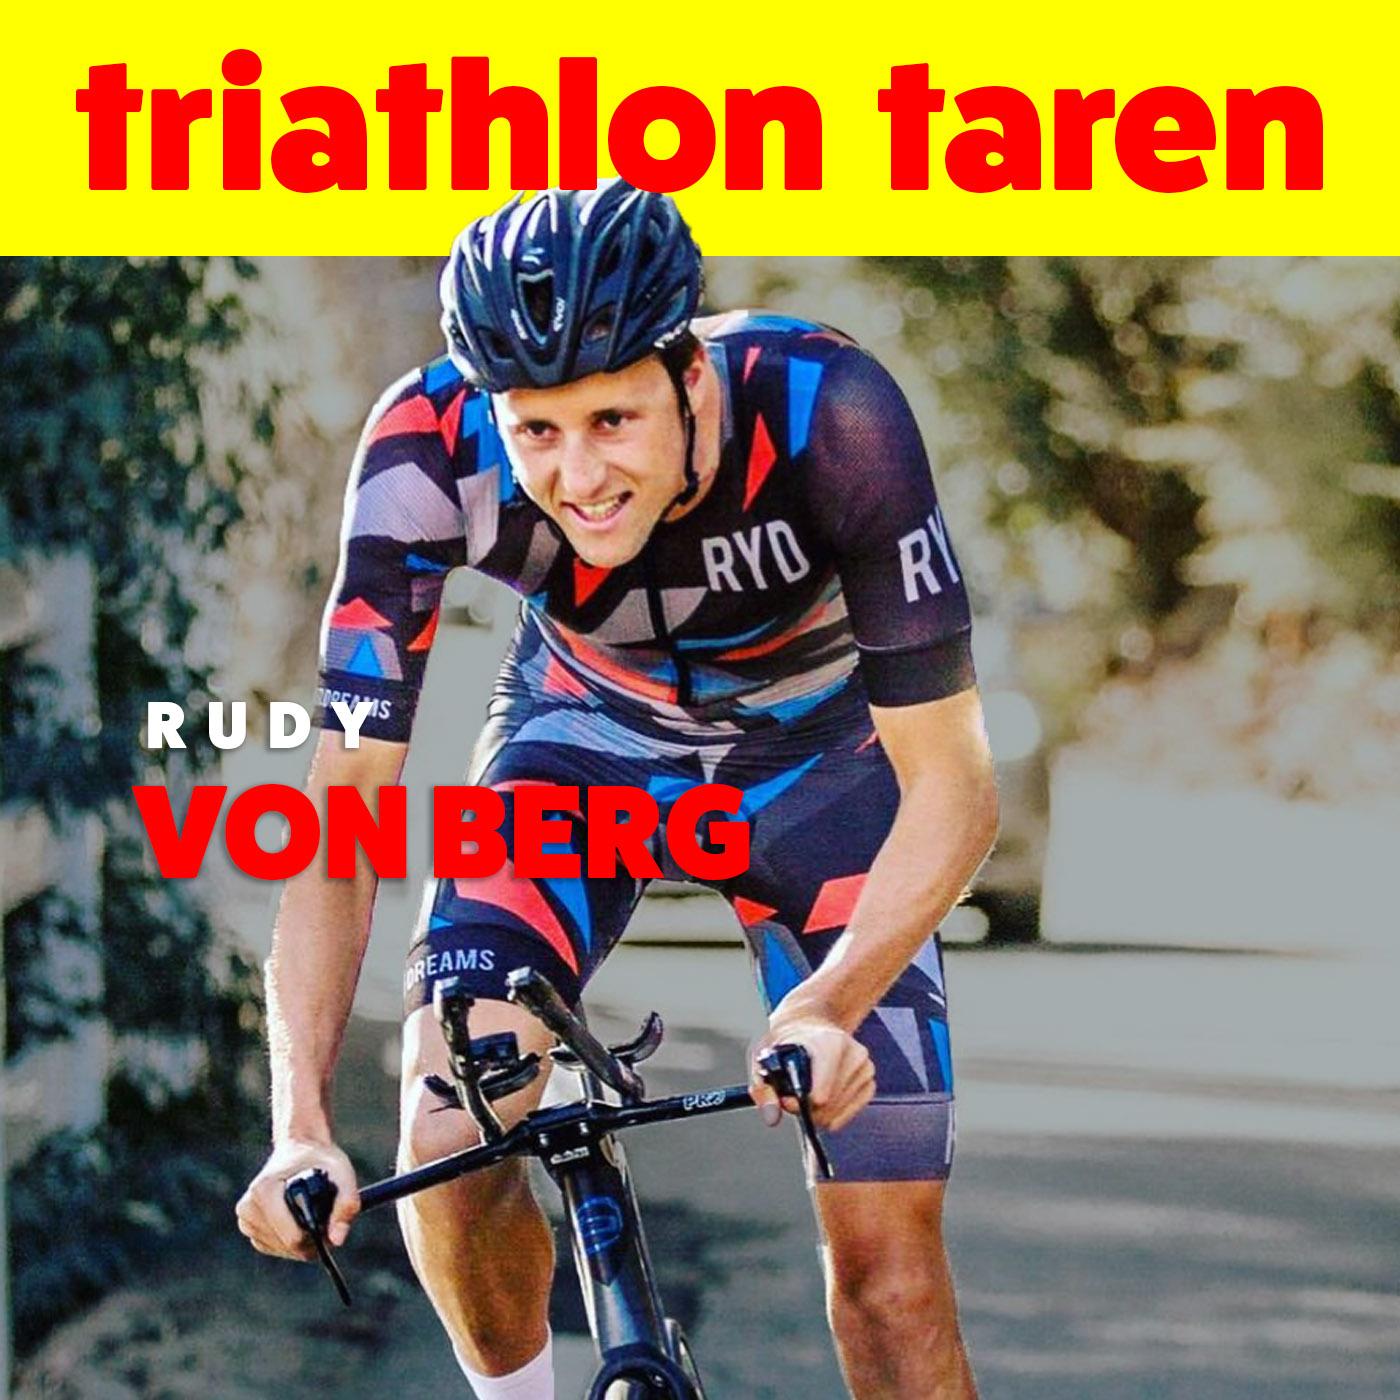 2019 IM 70.3 World Championship Scouting Report with Rudy Von Berg